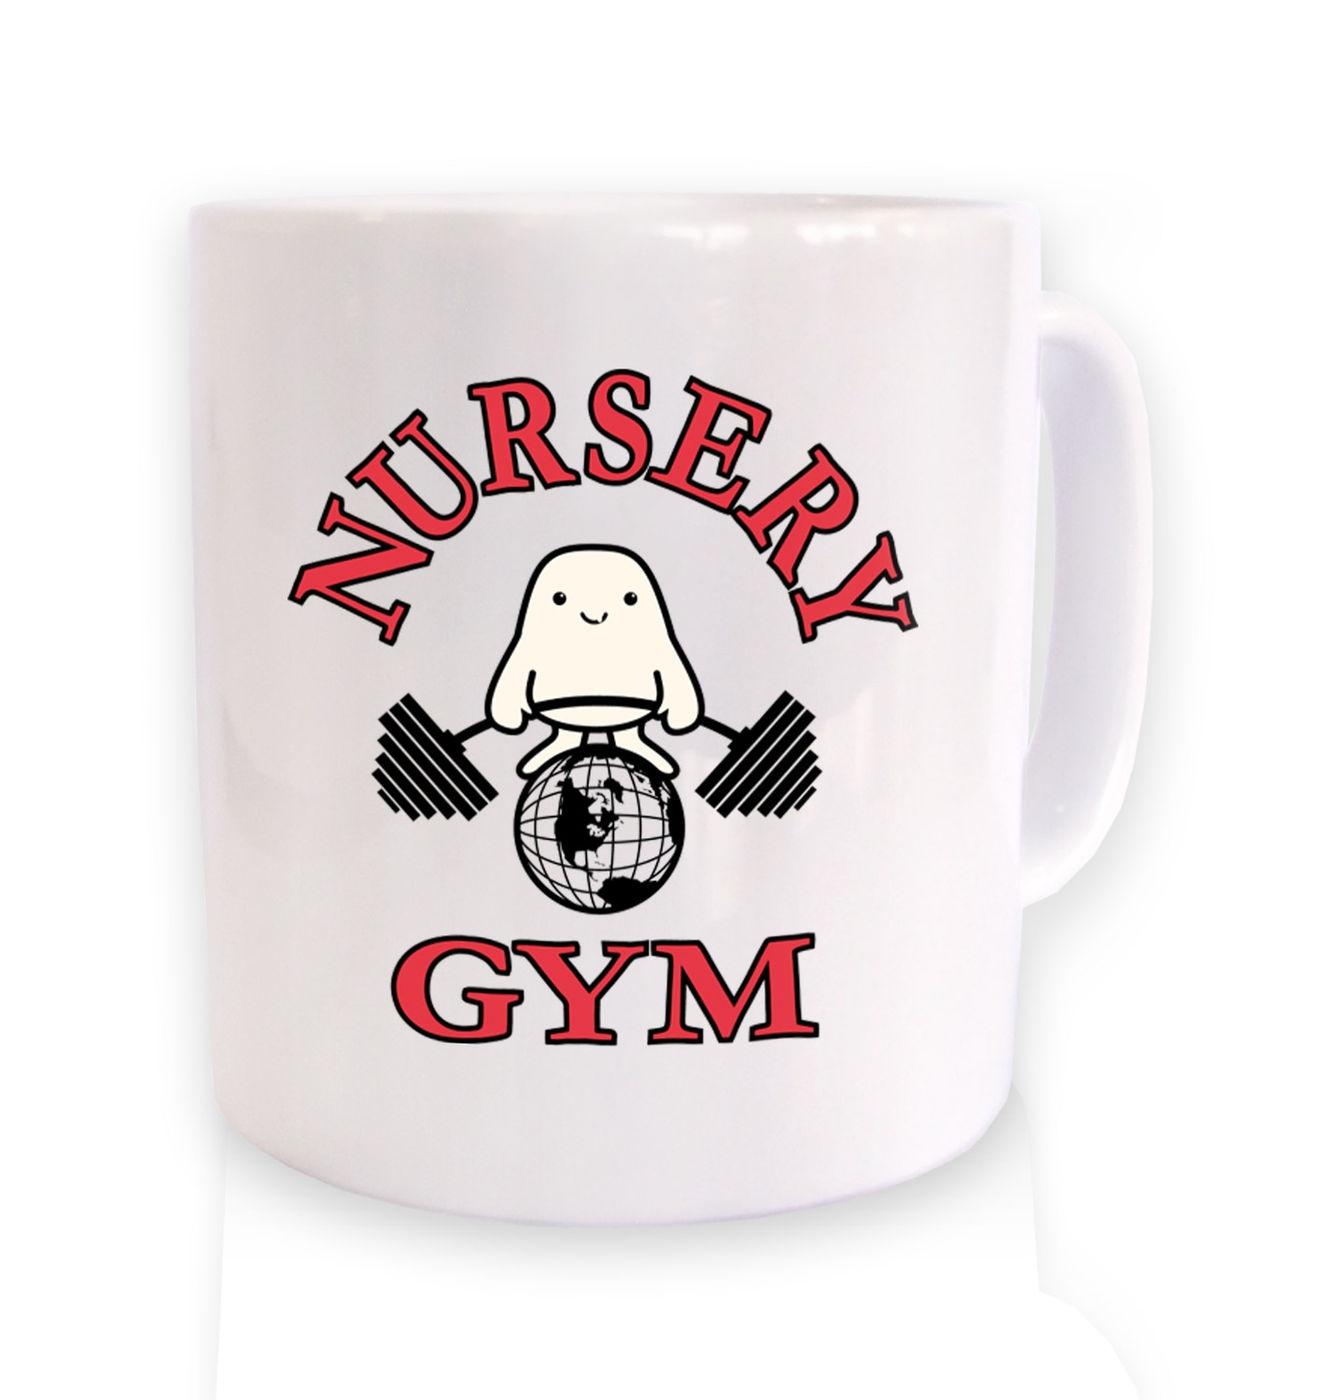 Nursery Gym mug by Something Geeky